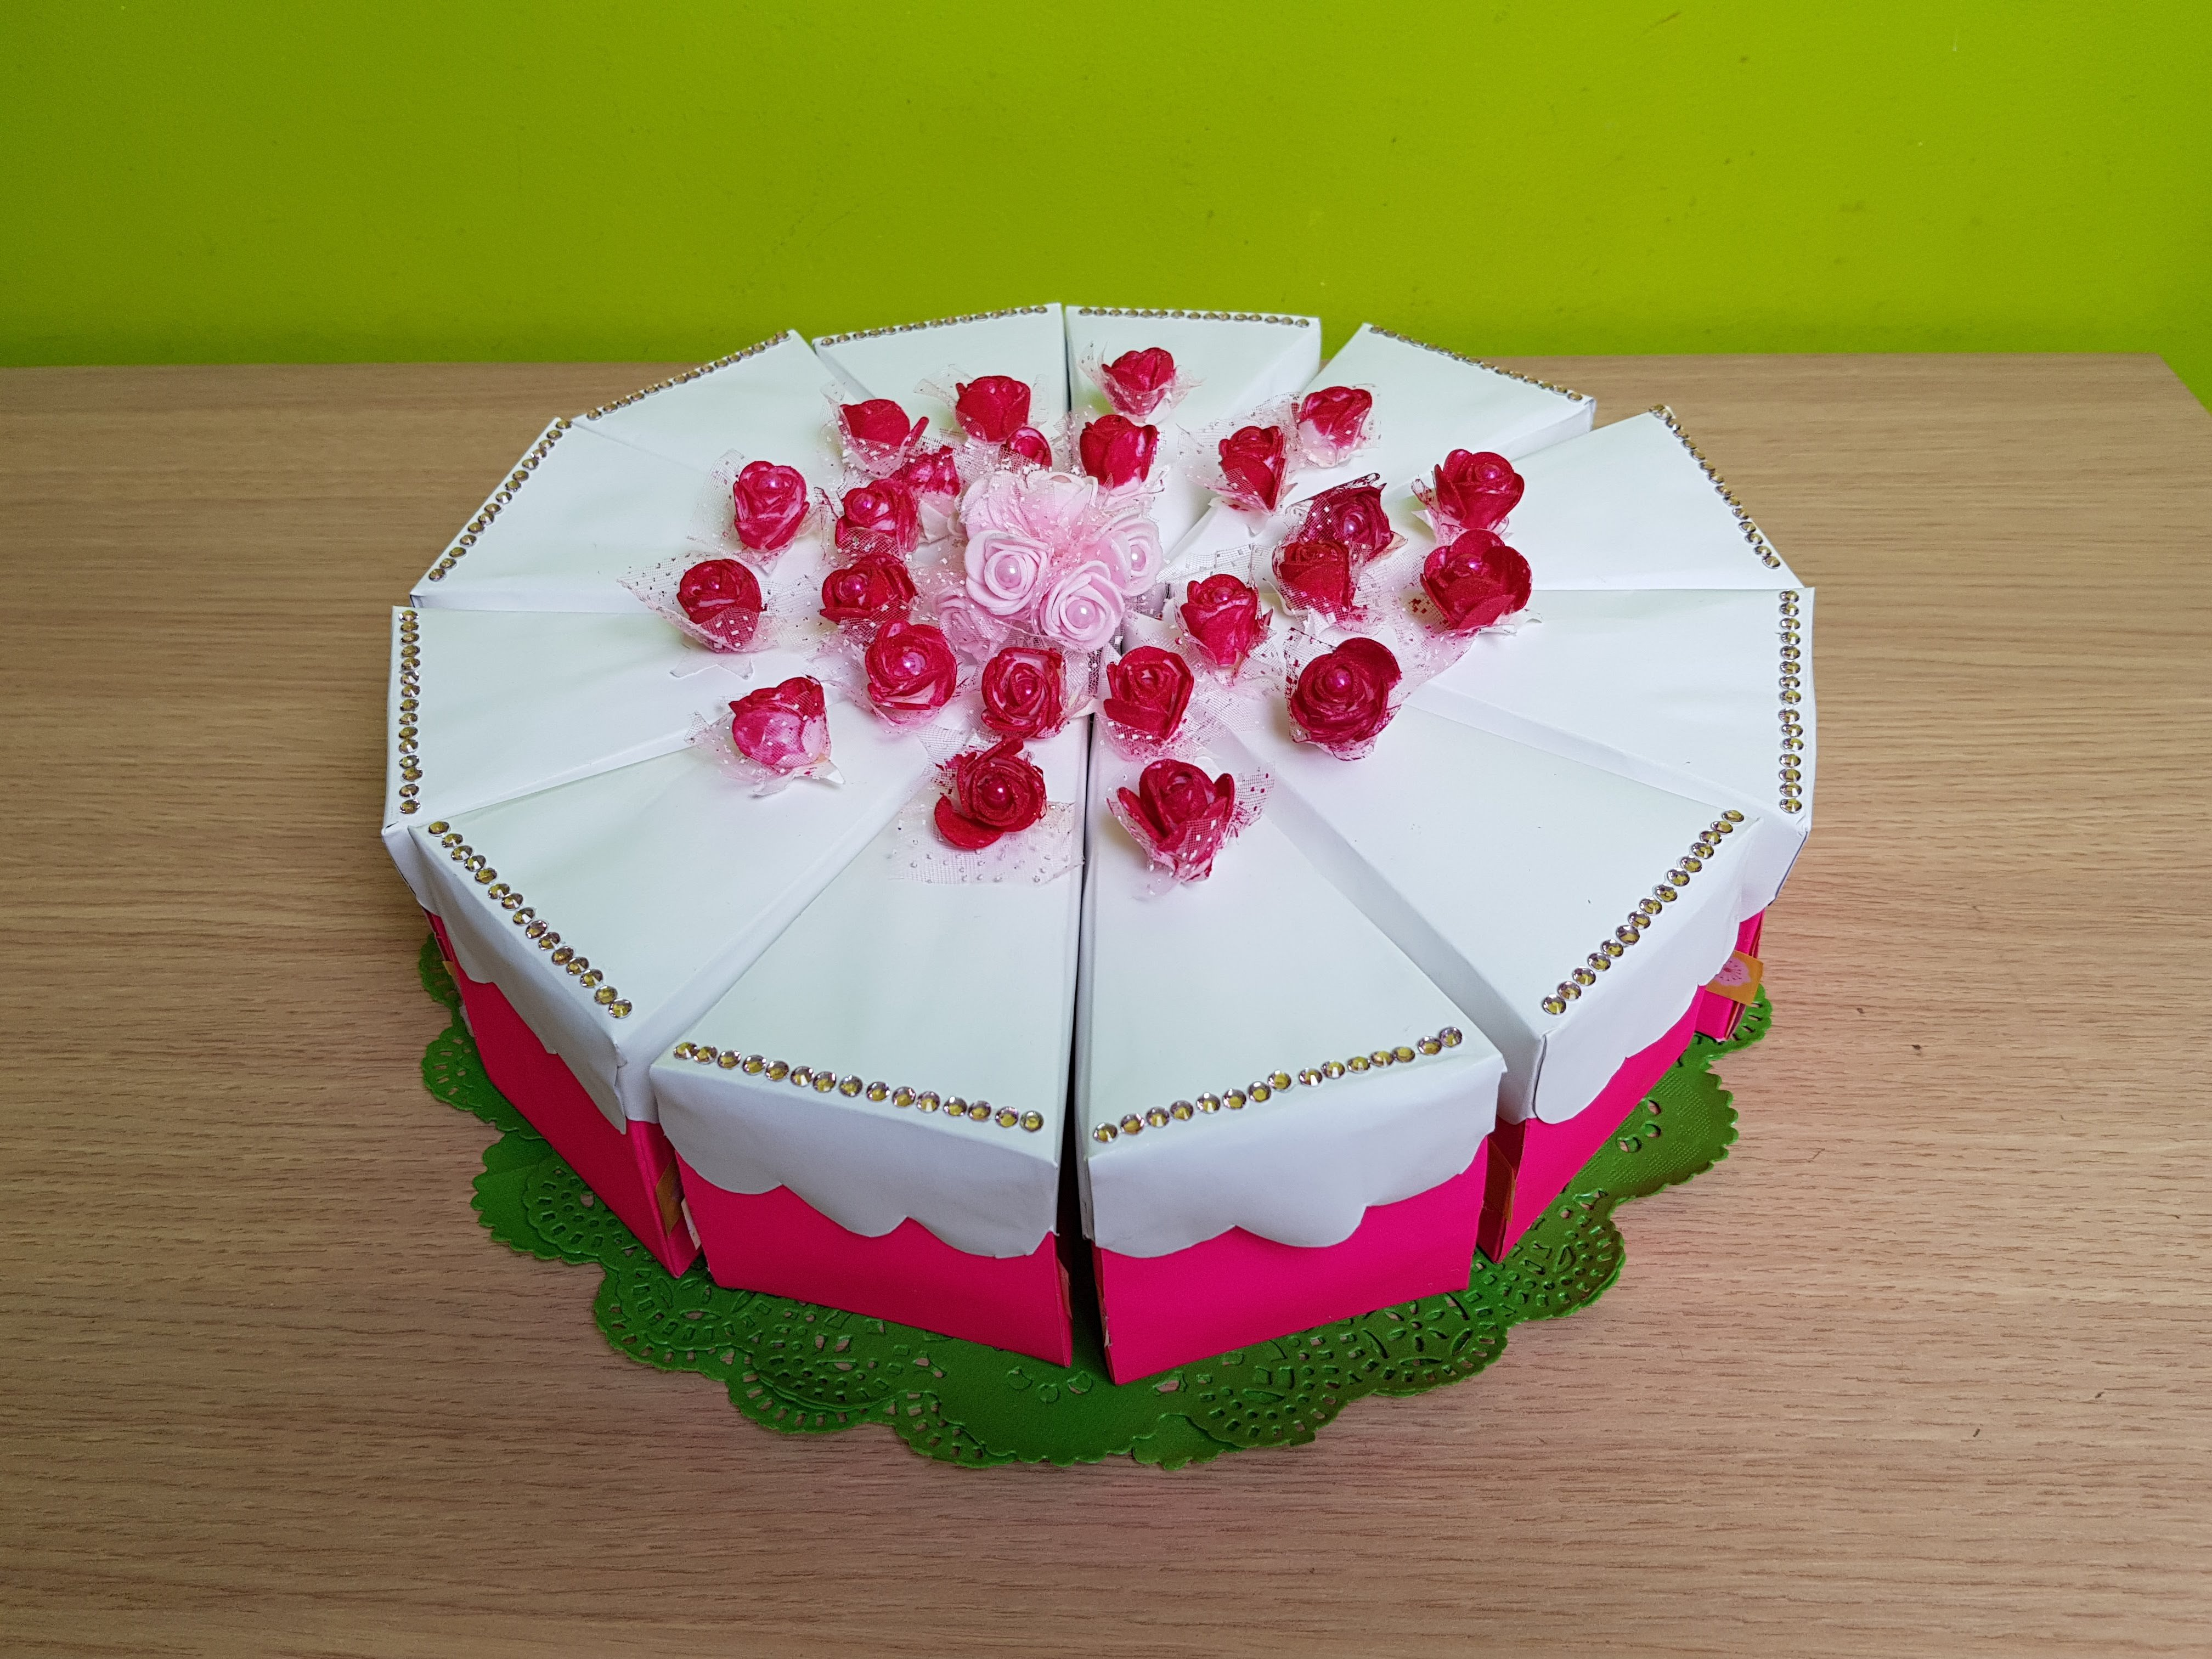 TORTA BOMBONIERA SLICE OF CAKE BOX TUTORIAL DIY